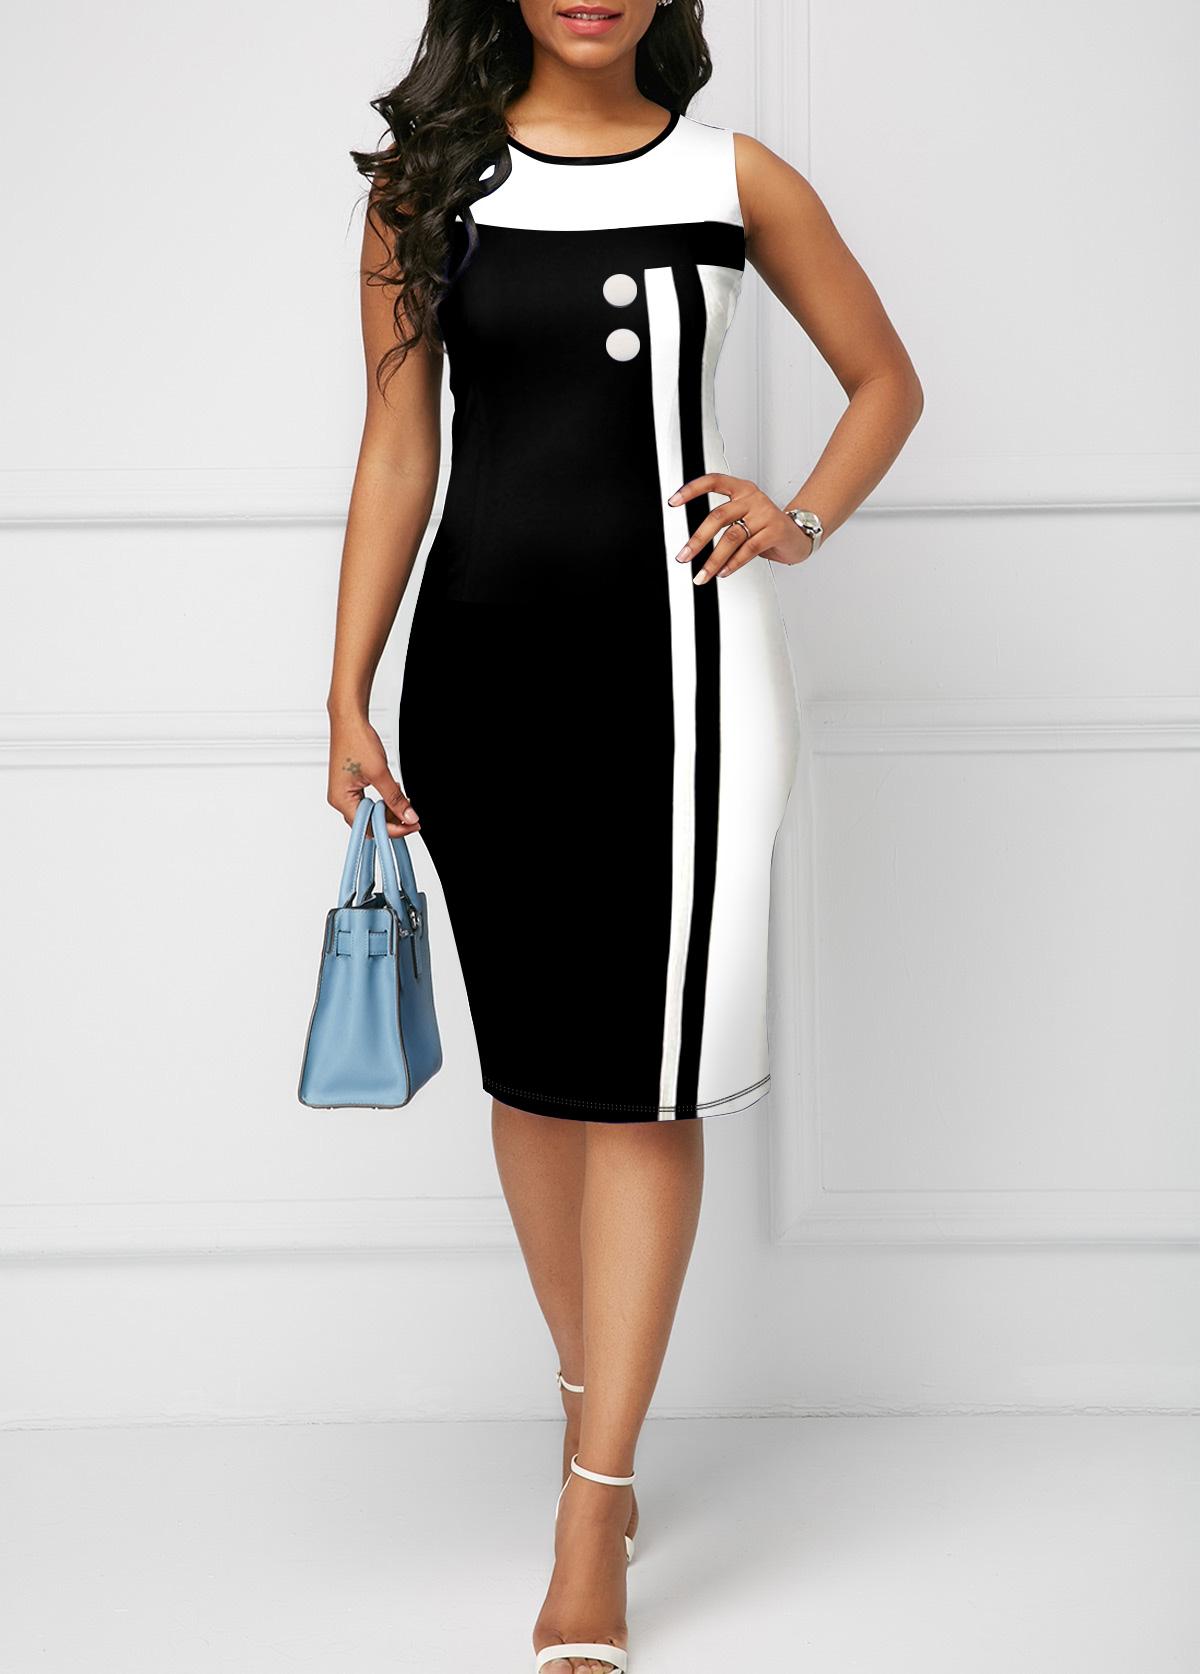 Round Neck Sleeveless Contrast Bodycon Dress